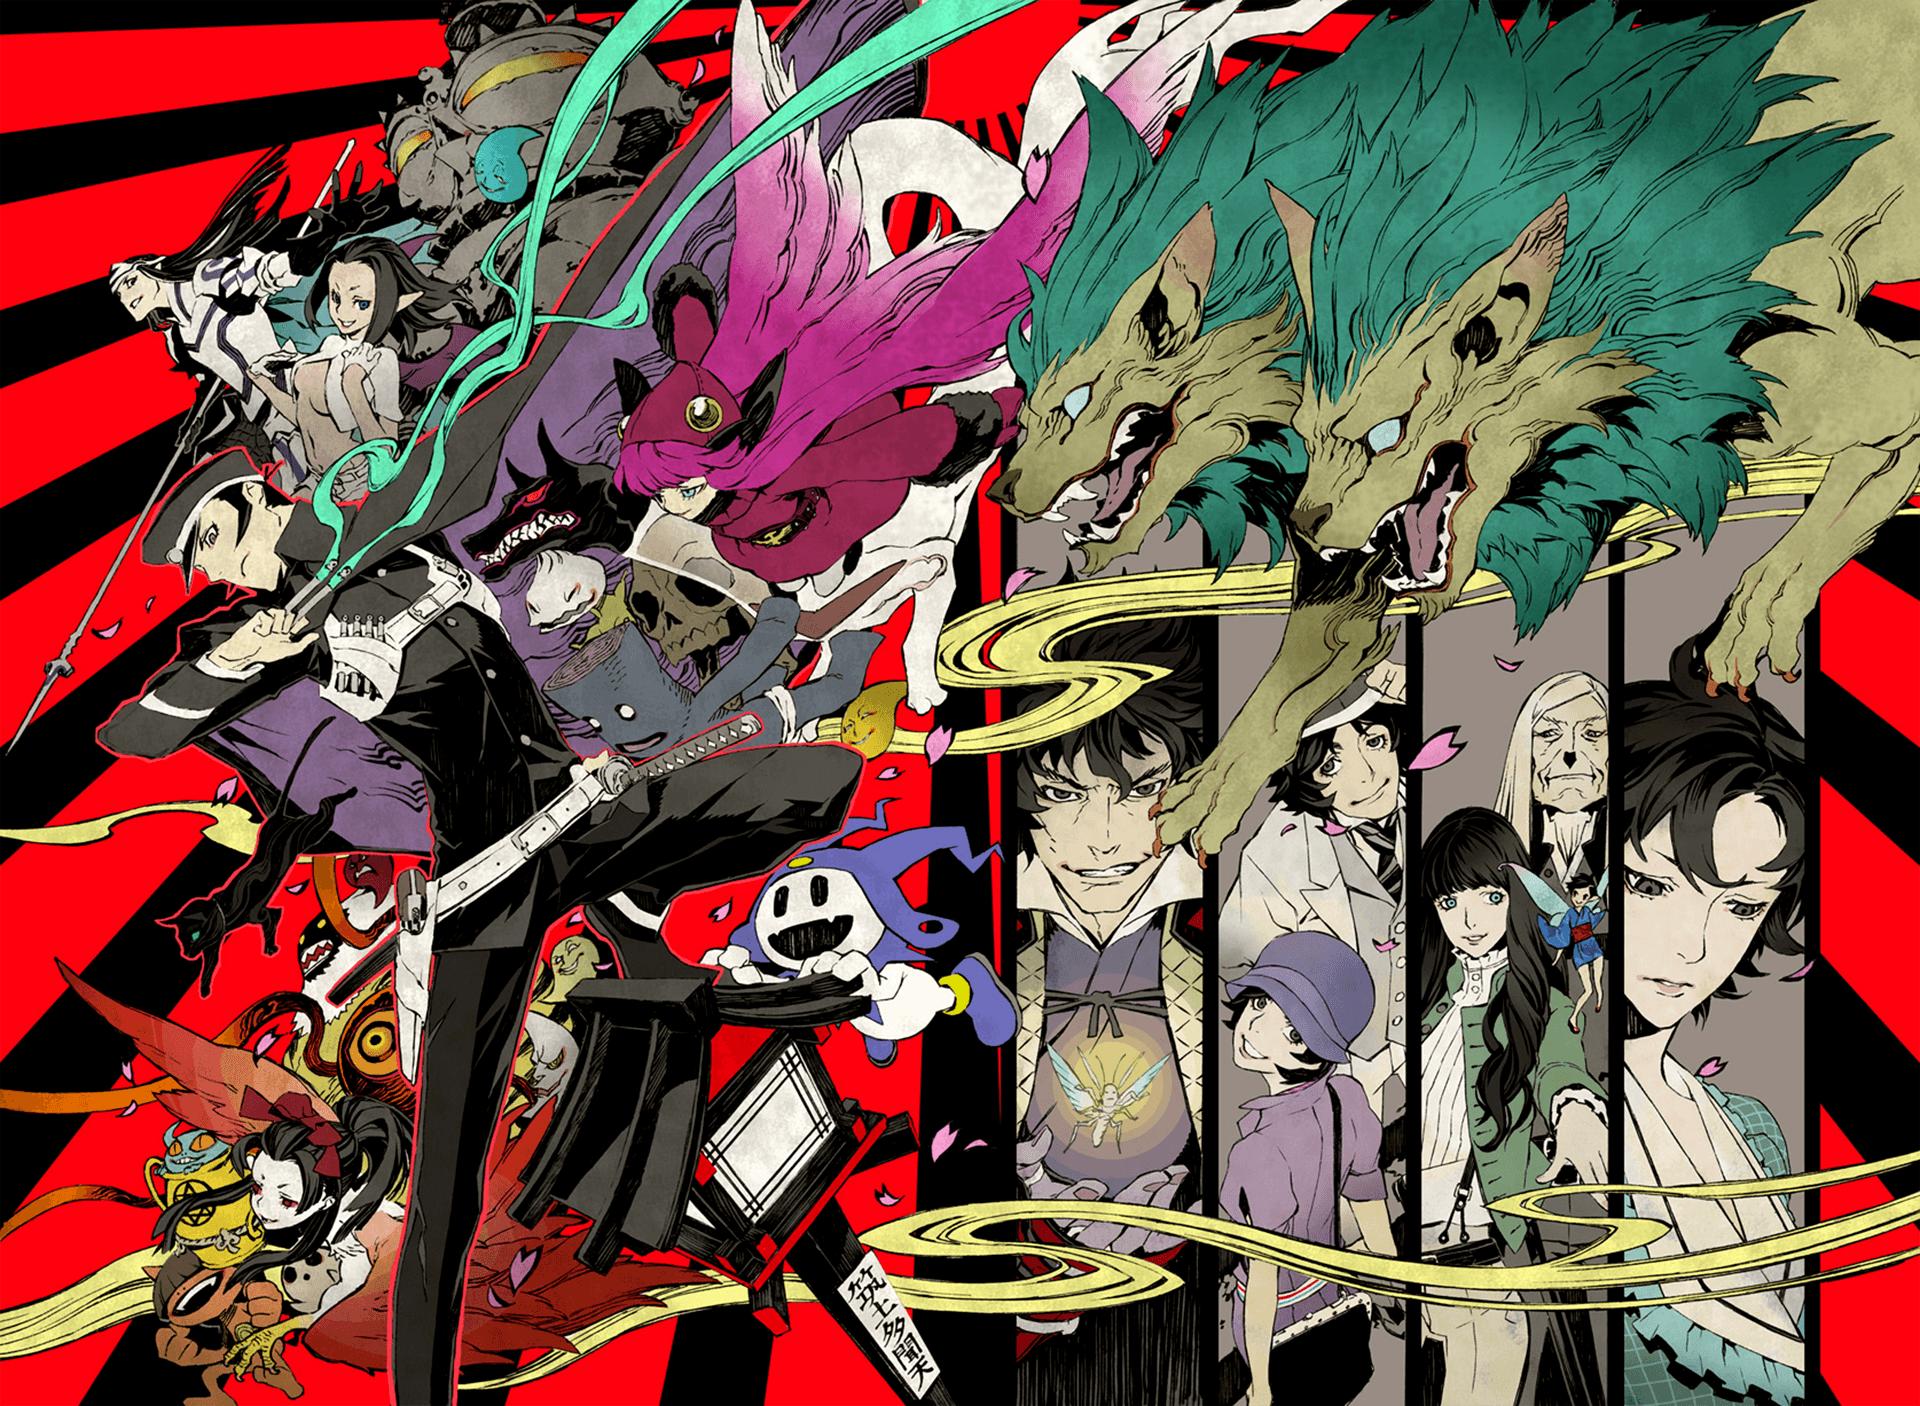 Shin Megami Tensei Wallpapers Top Free Shin Megami Tensei